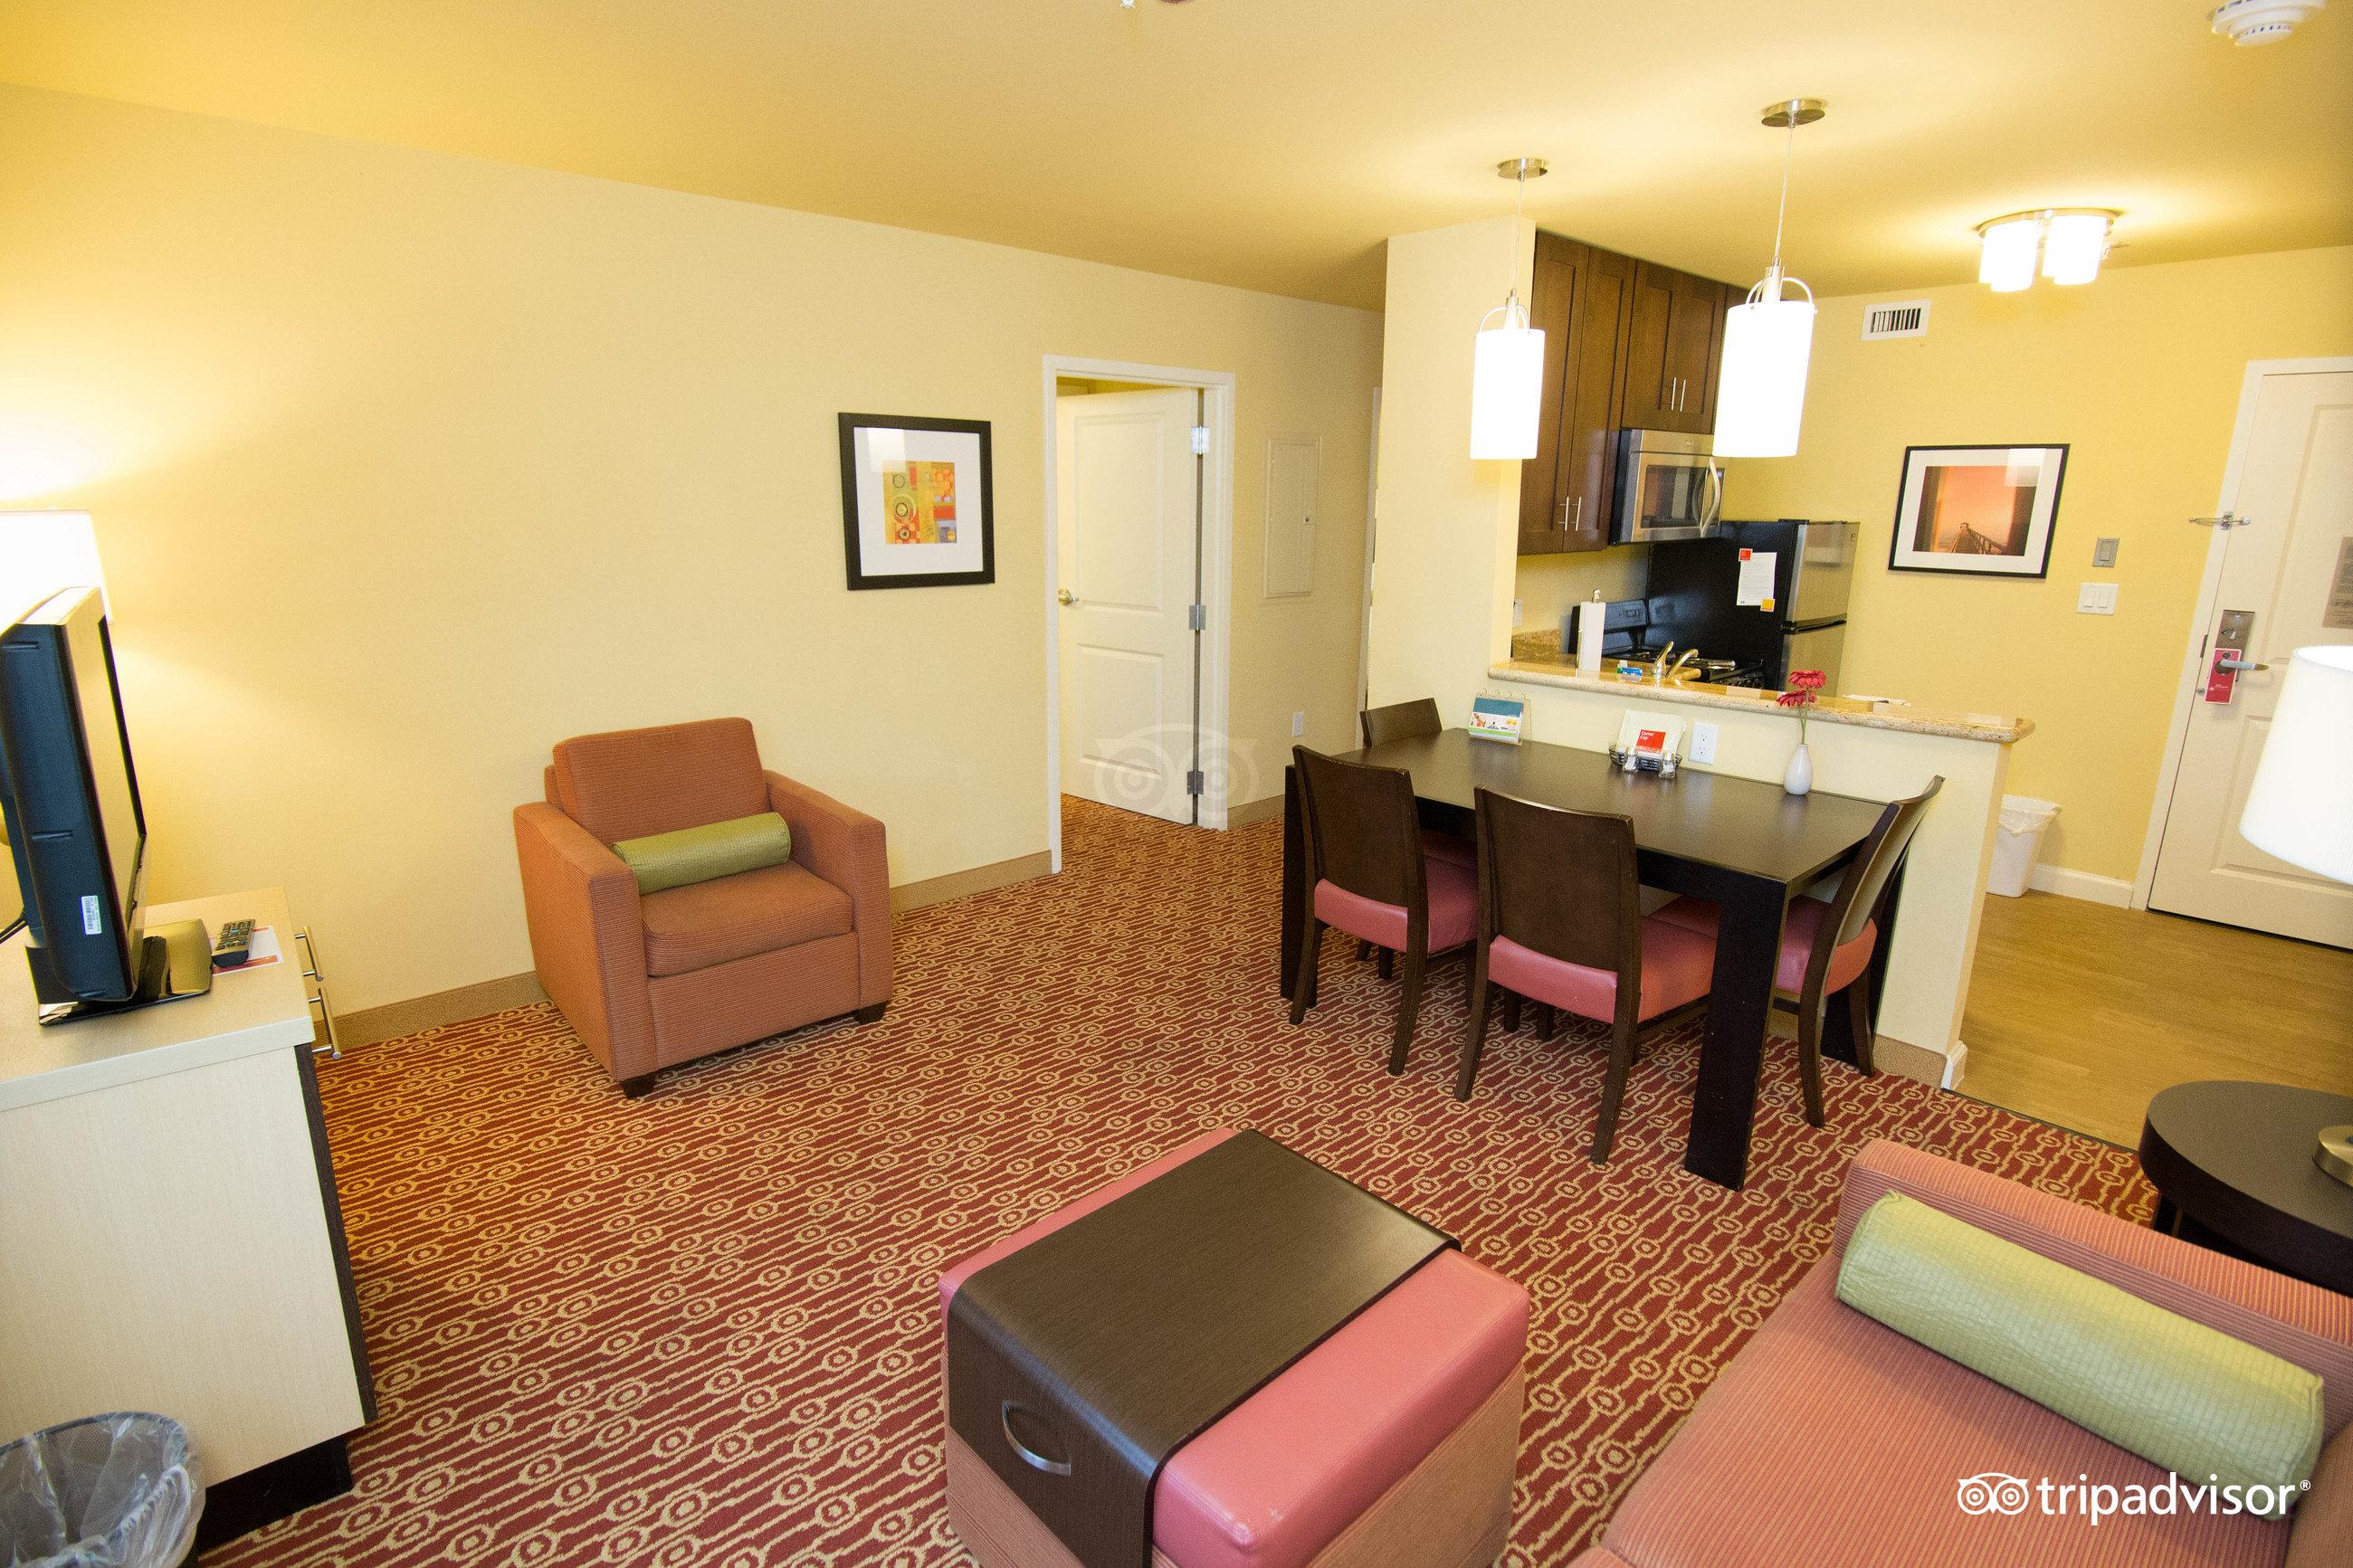 Two Bedroom Suites Galveston Tx Picture On With Two Bedroom Suites  Galveston Tx  Two BedroomTwo Bedroom Suites Dallas Tx   pilotschoolbanyuwangi com. 2 Bedroom Hotel Suites In Dallas Texas. Home Design Ideas